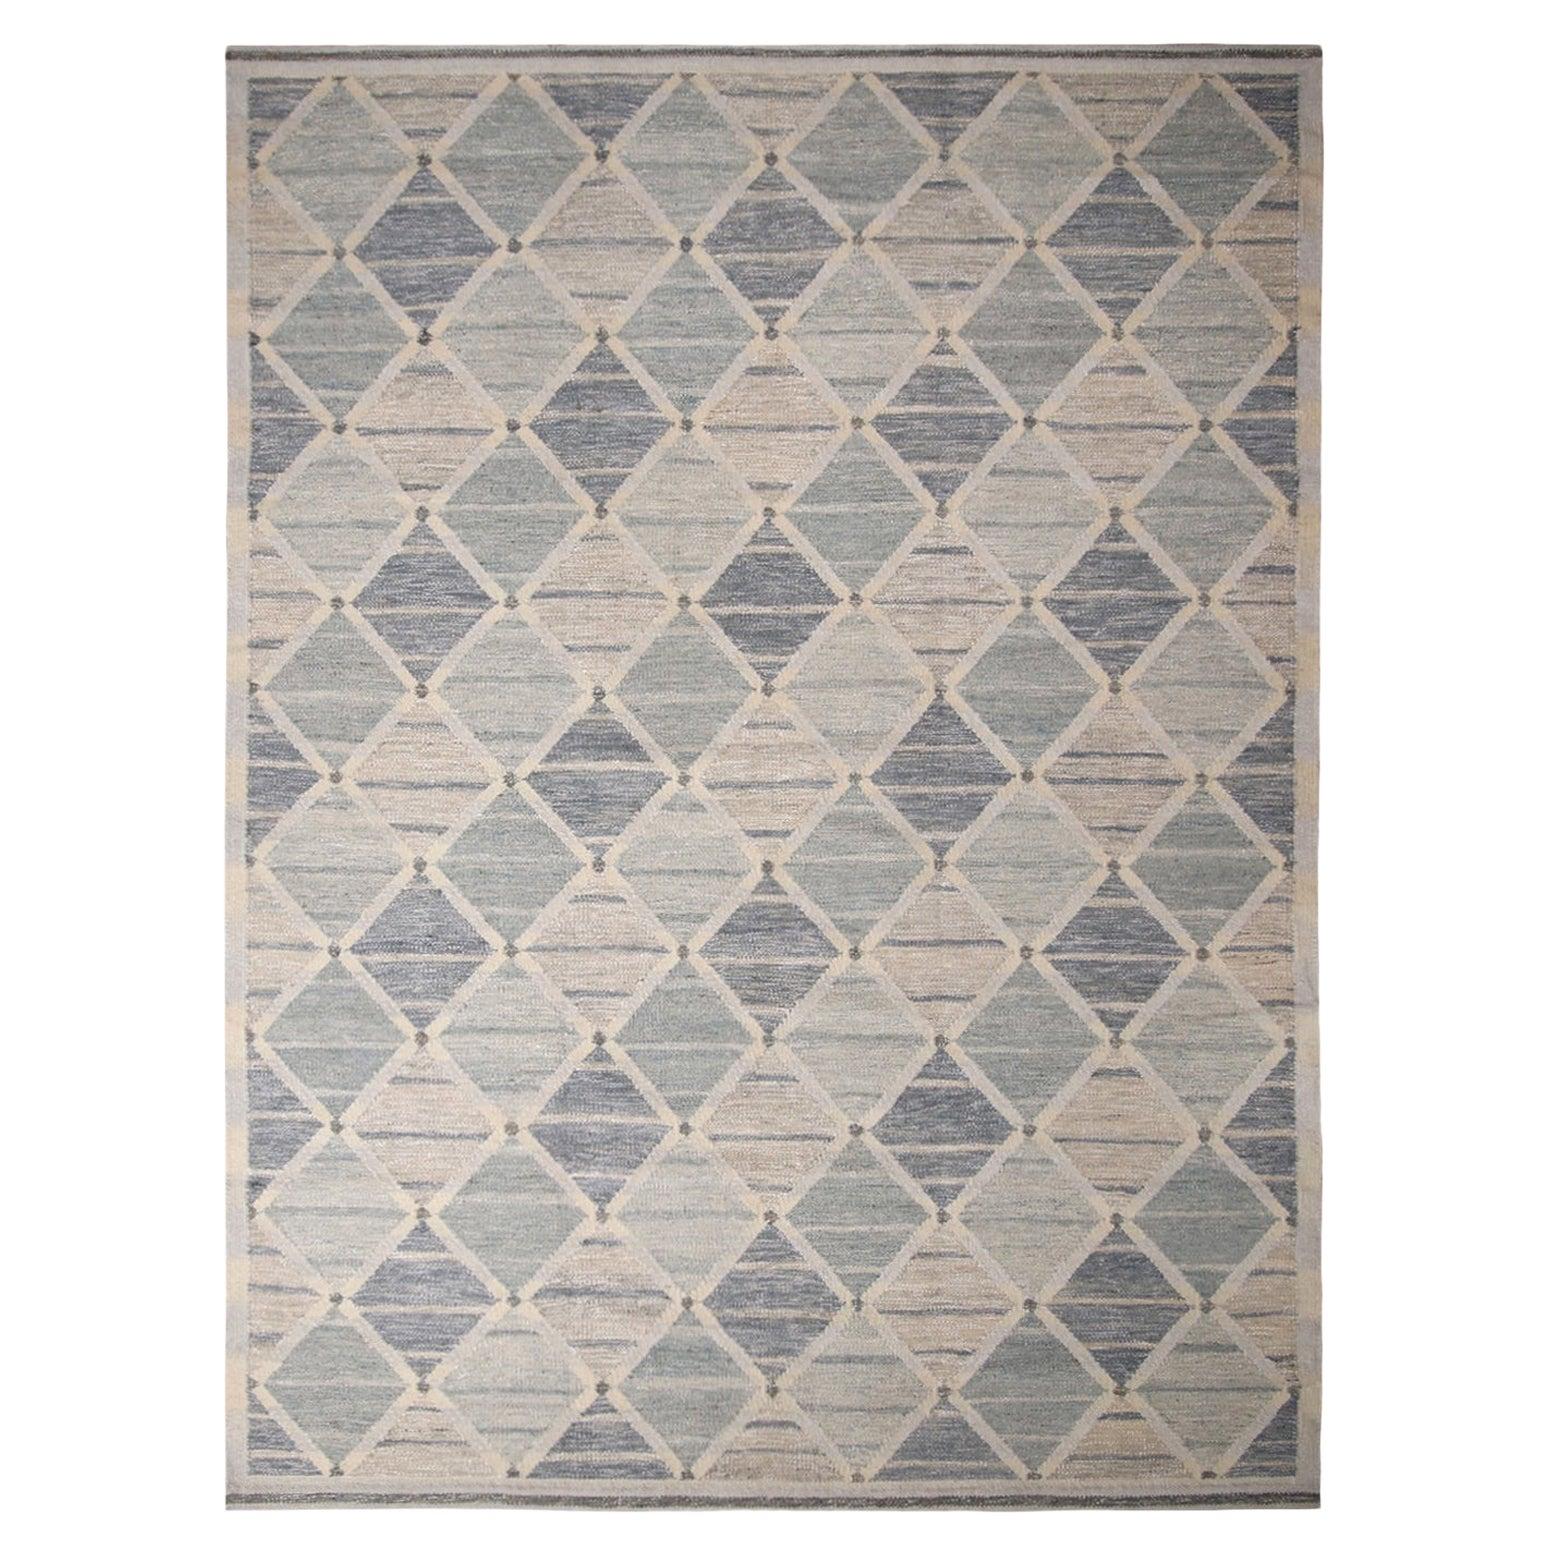 Rug & Kilim's Scandinavian-Inspired Silver-Gray and Blue Wool Kilim Rug